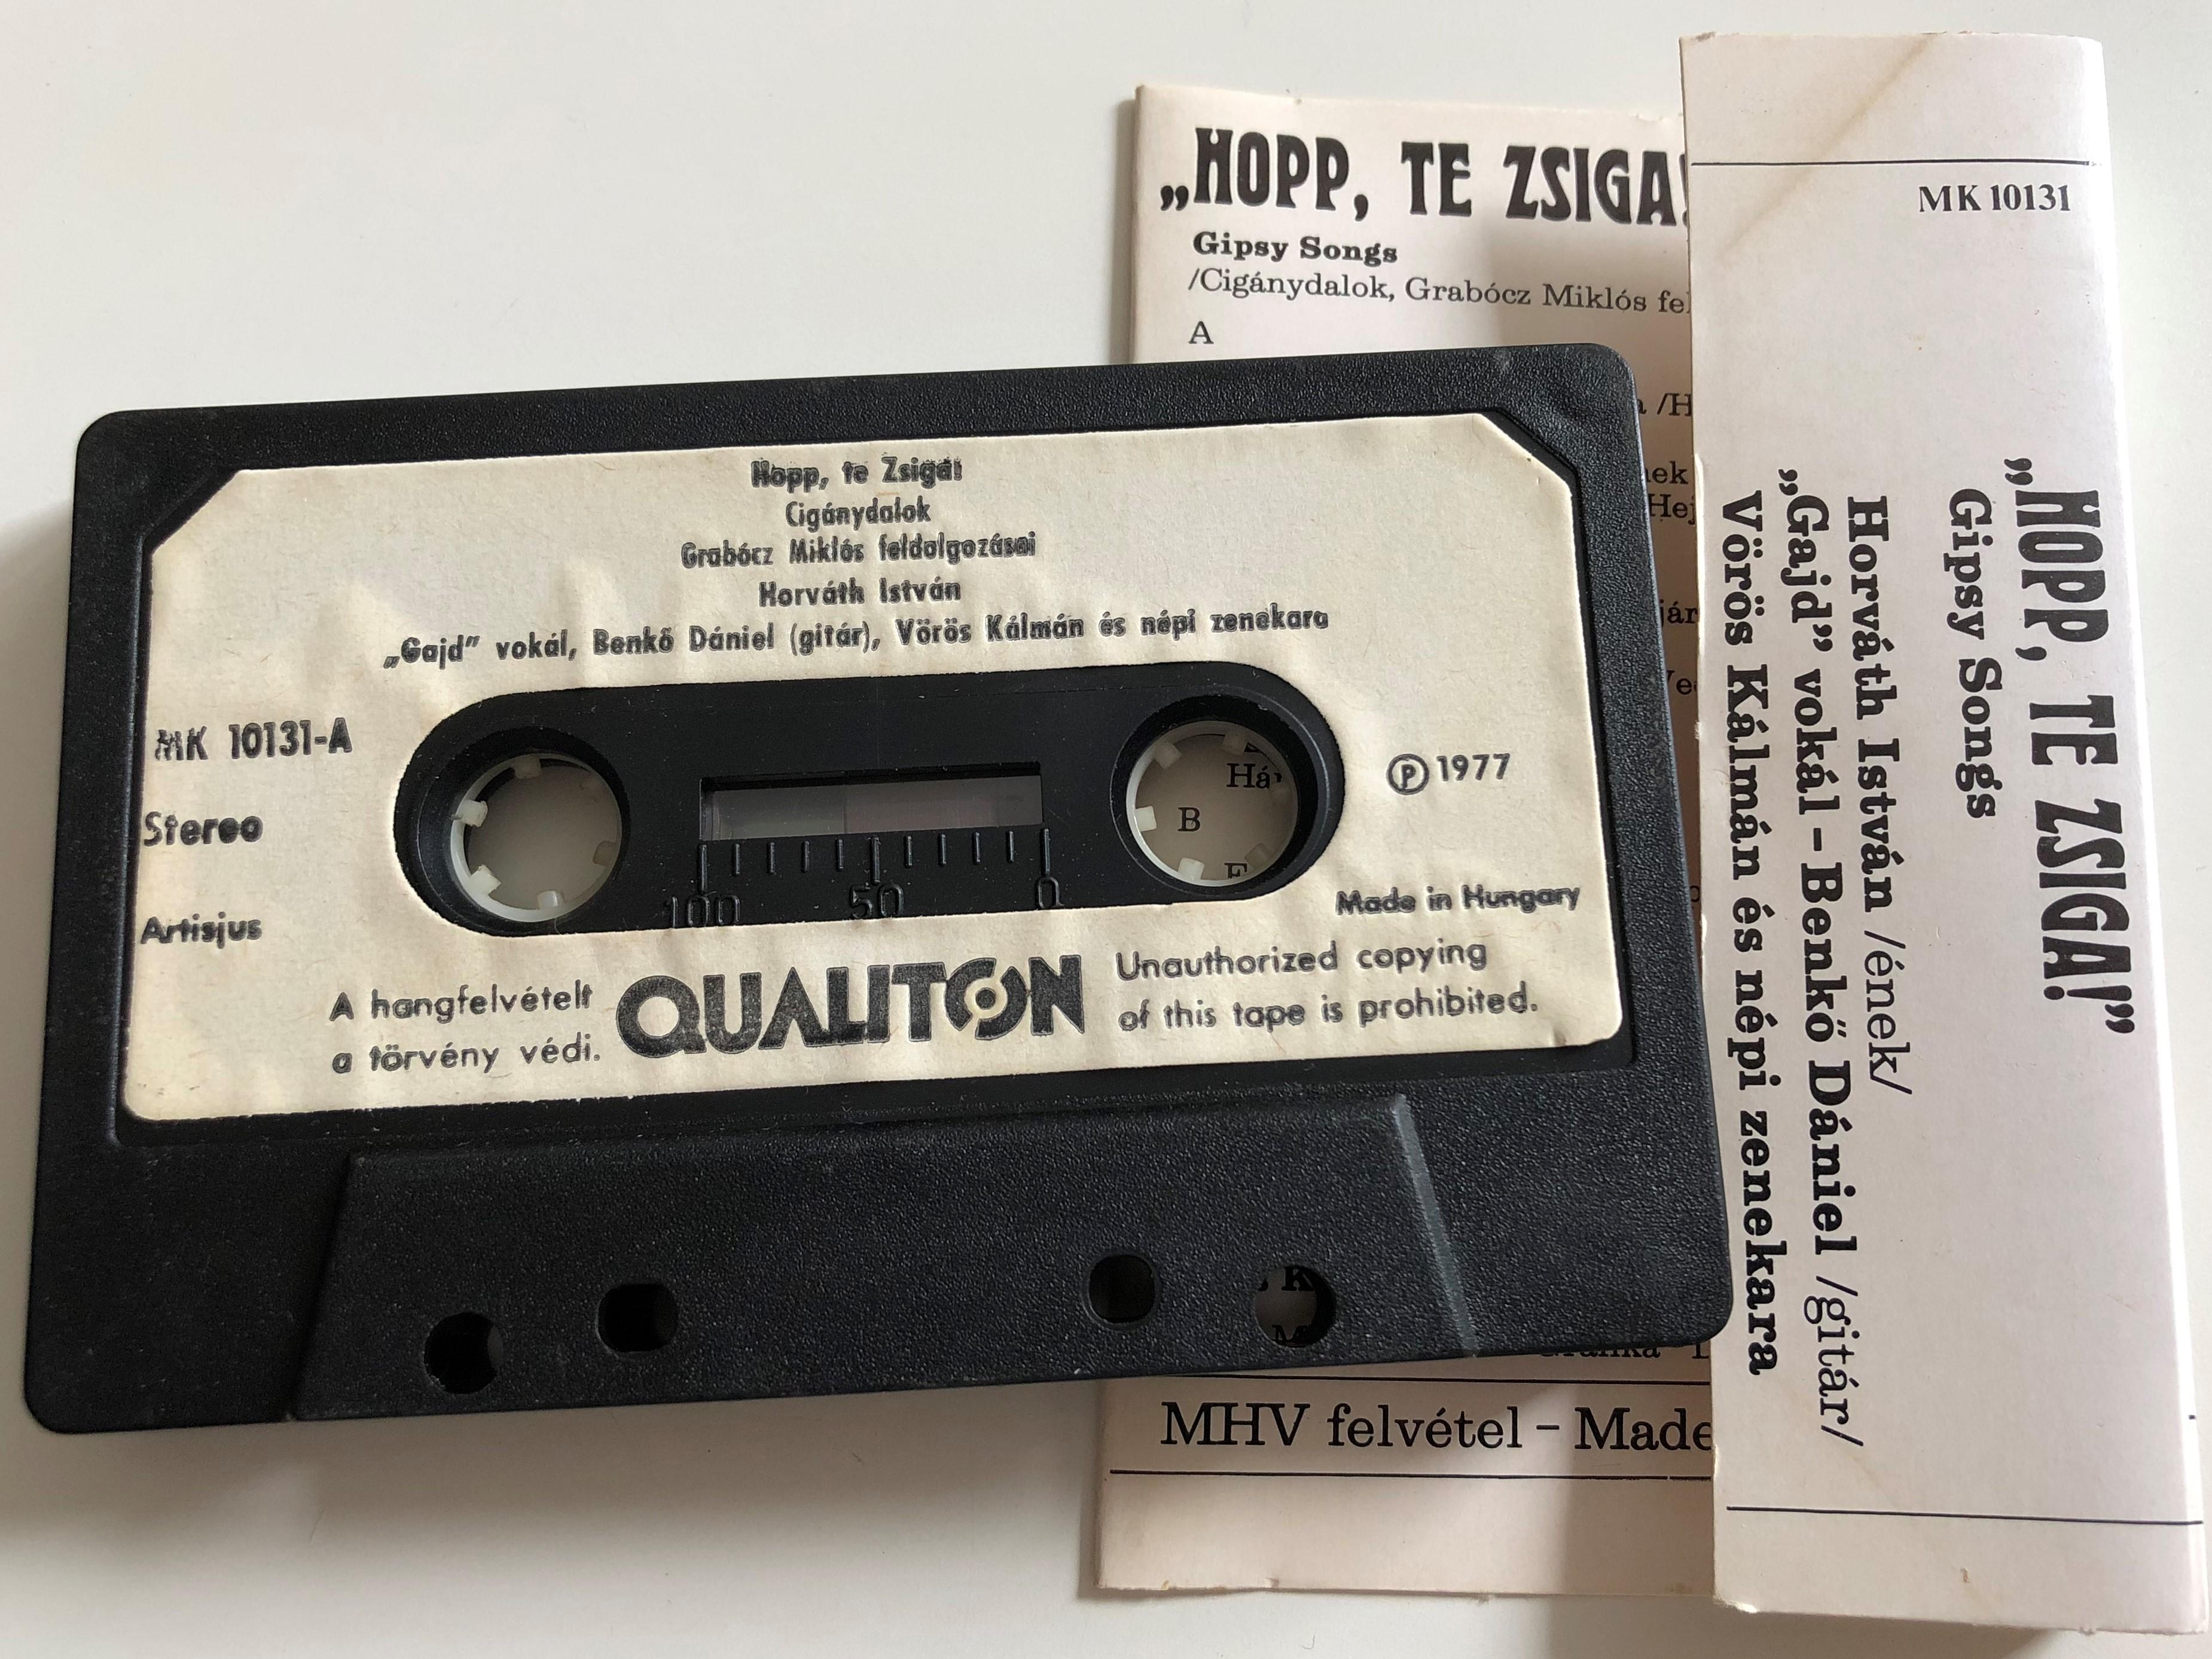 hopp-te-zsiga-gipsy-songs-horv-th-istv-n-gajd-vokal-benko-daniel-voros-kalman-es-nepi-zenekara-qualiton-cassette-stereo-mk-10131-3-.jpg